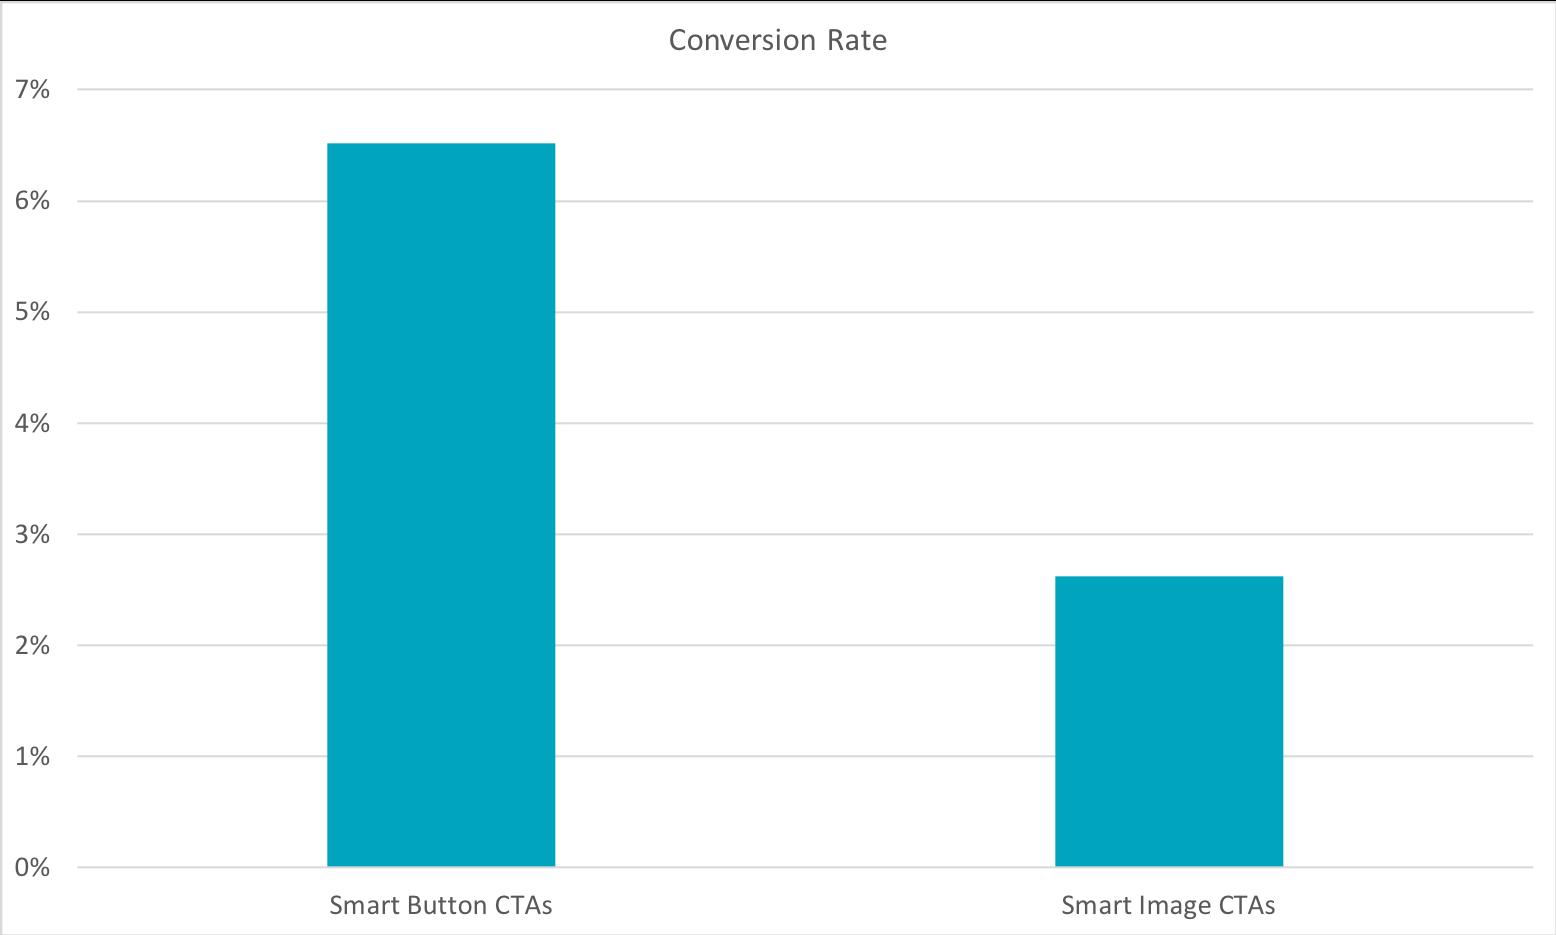 Bar graph showing how smart button CTAs perform better than image CTAs